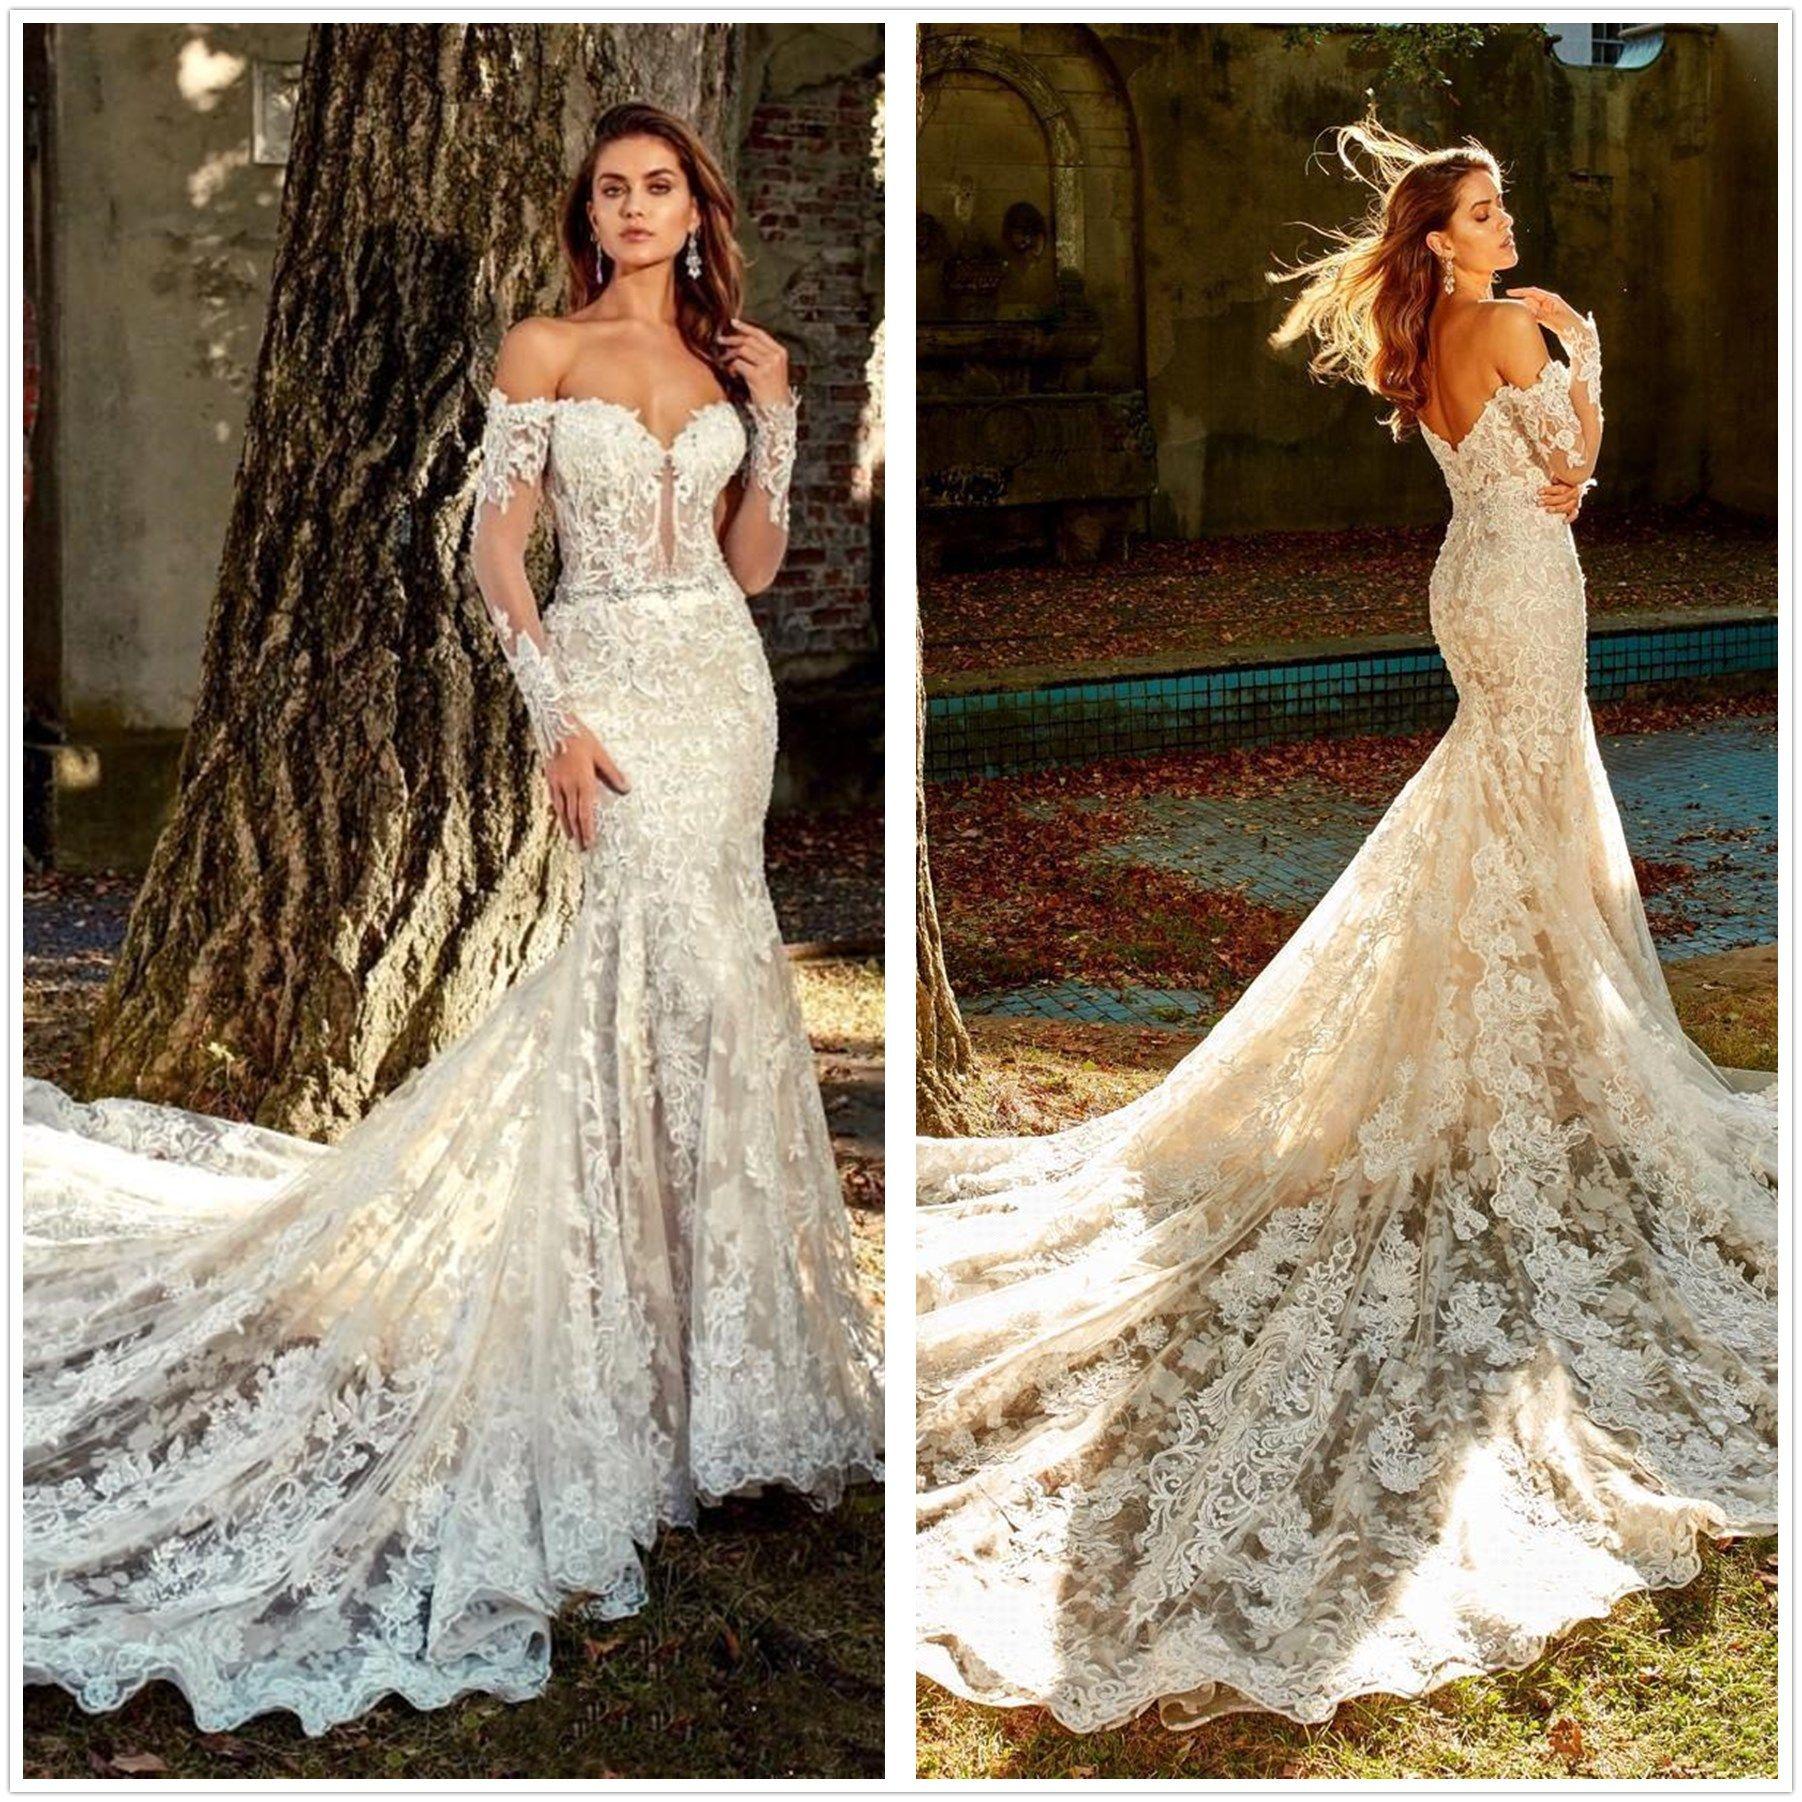 Wedding Gowns Lace Mermaid Vintage Sash Off Shoulder Sweetheart Neckline Dresses